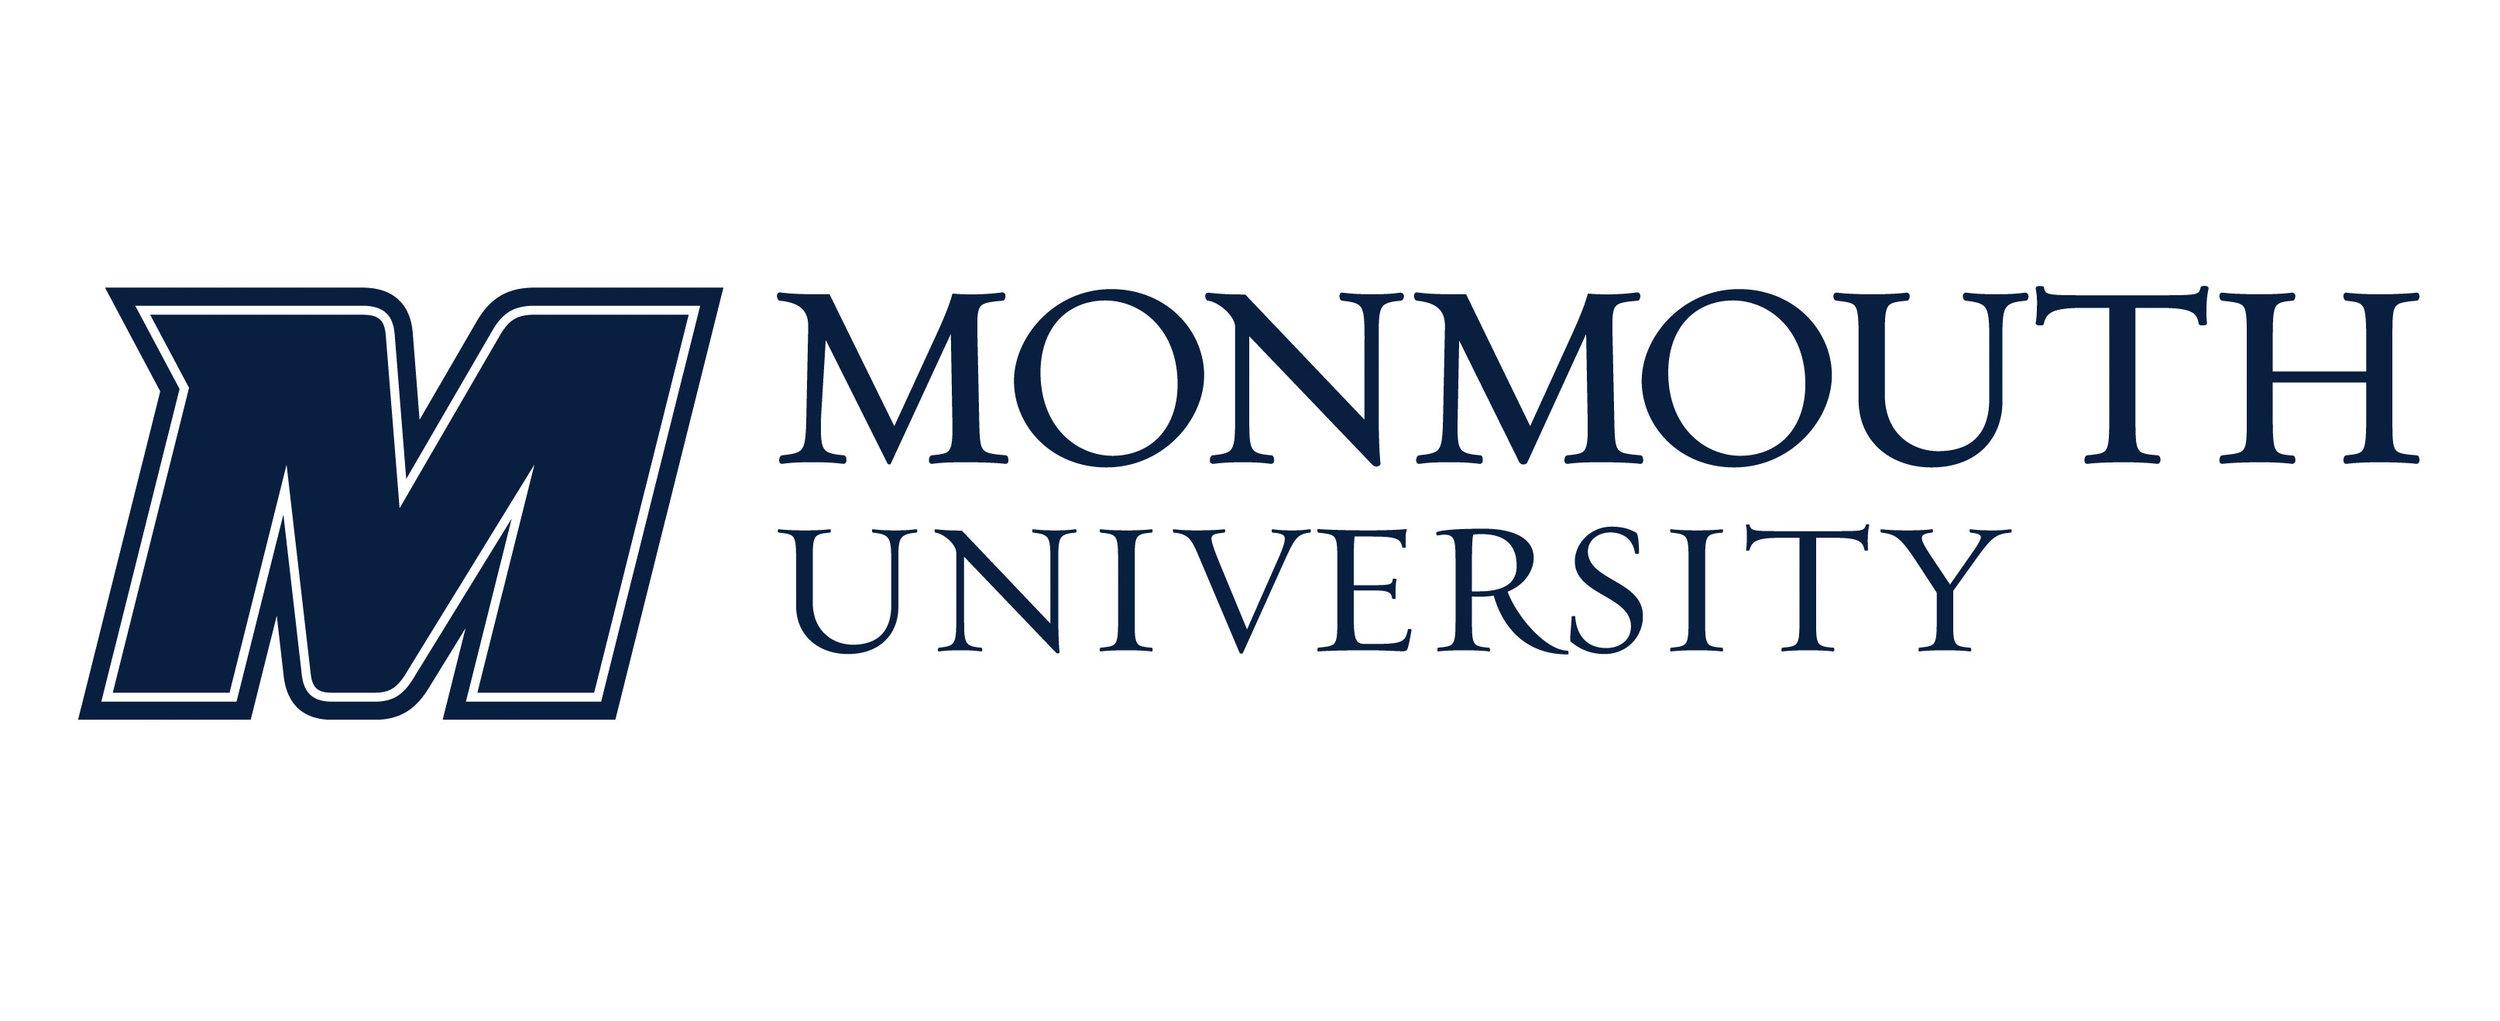 monmouth1.jpg